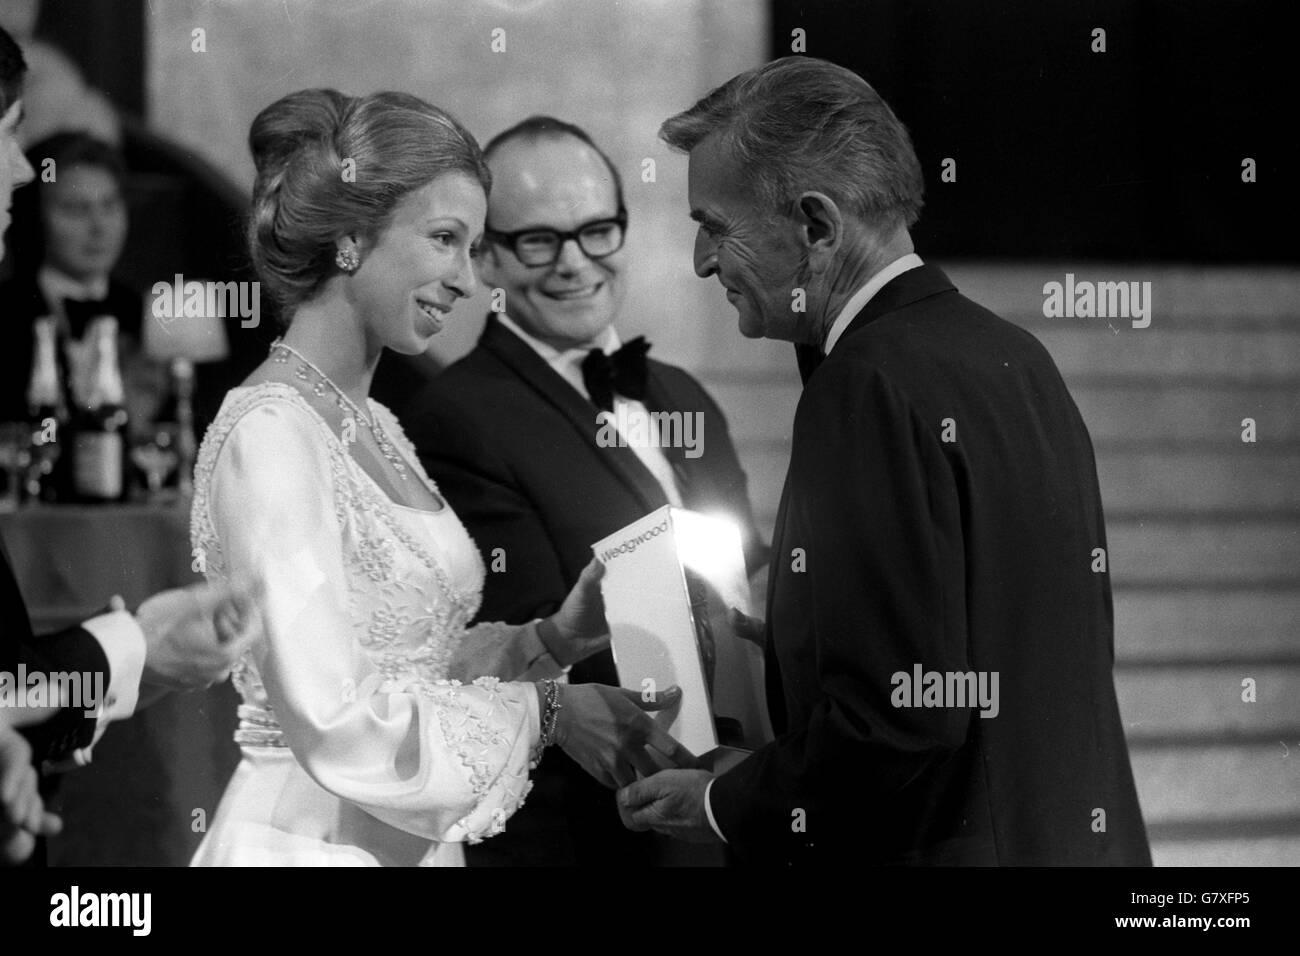 Film - Fellowship Award - Princess Anne and David Lean - London - Stock Image